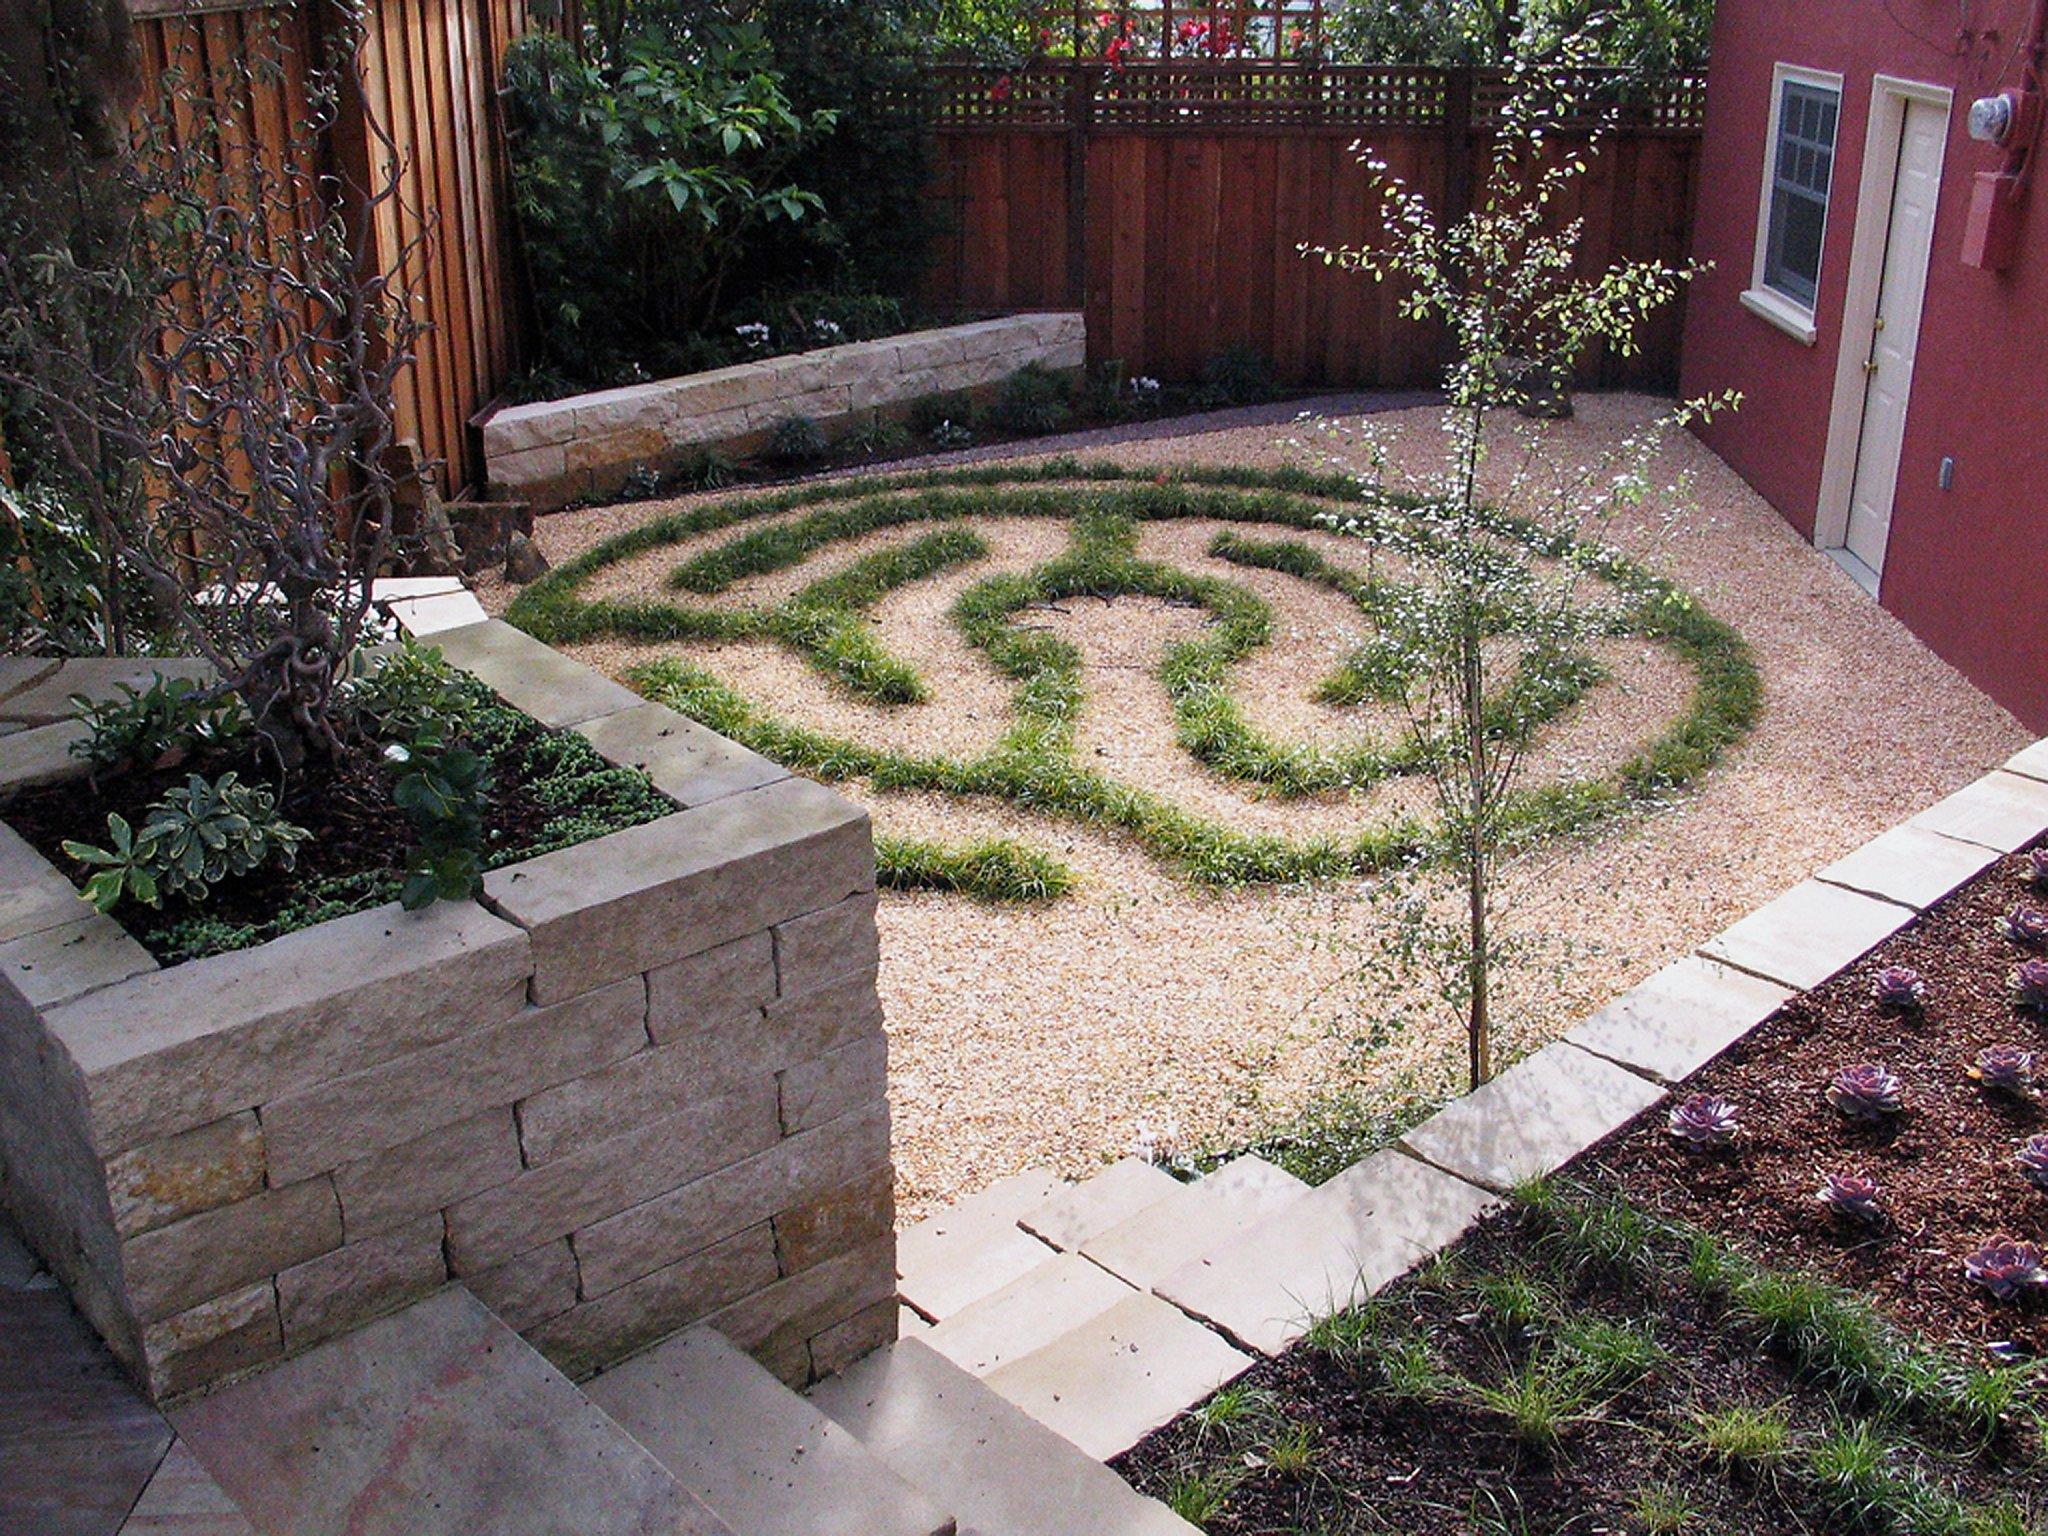 Drought landscaping: 5 inspiring lawn-free yards